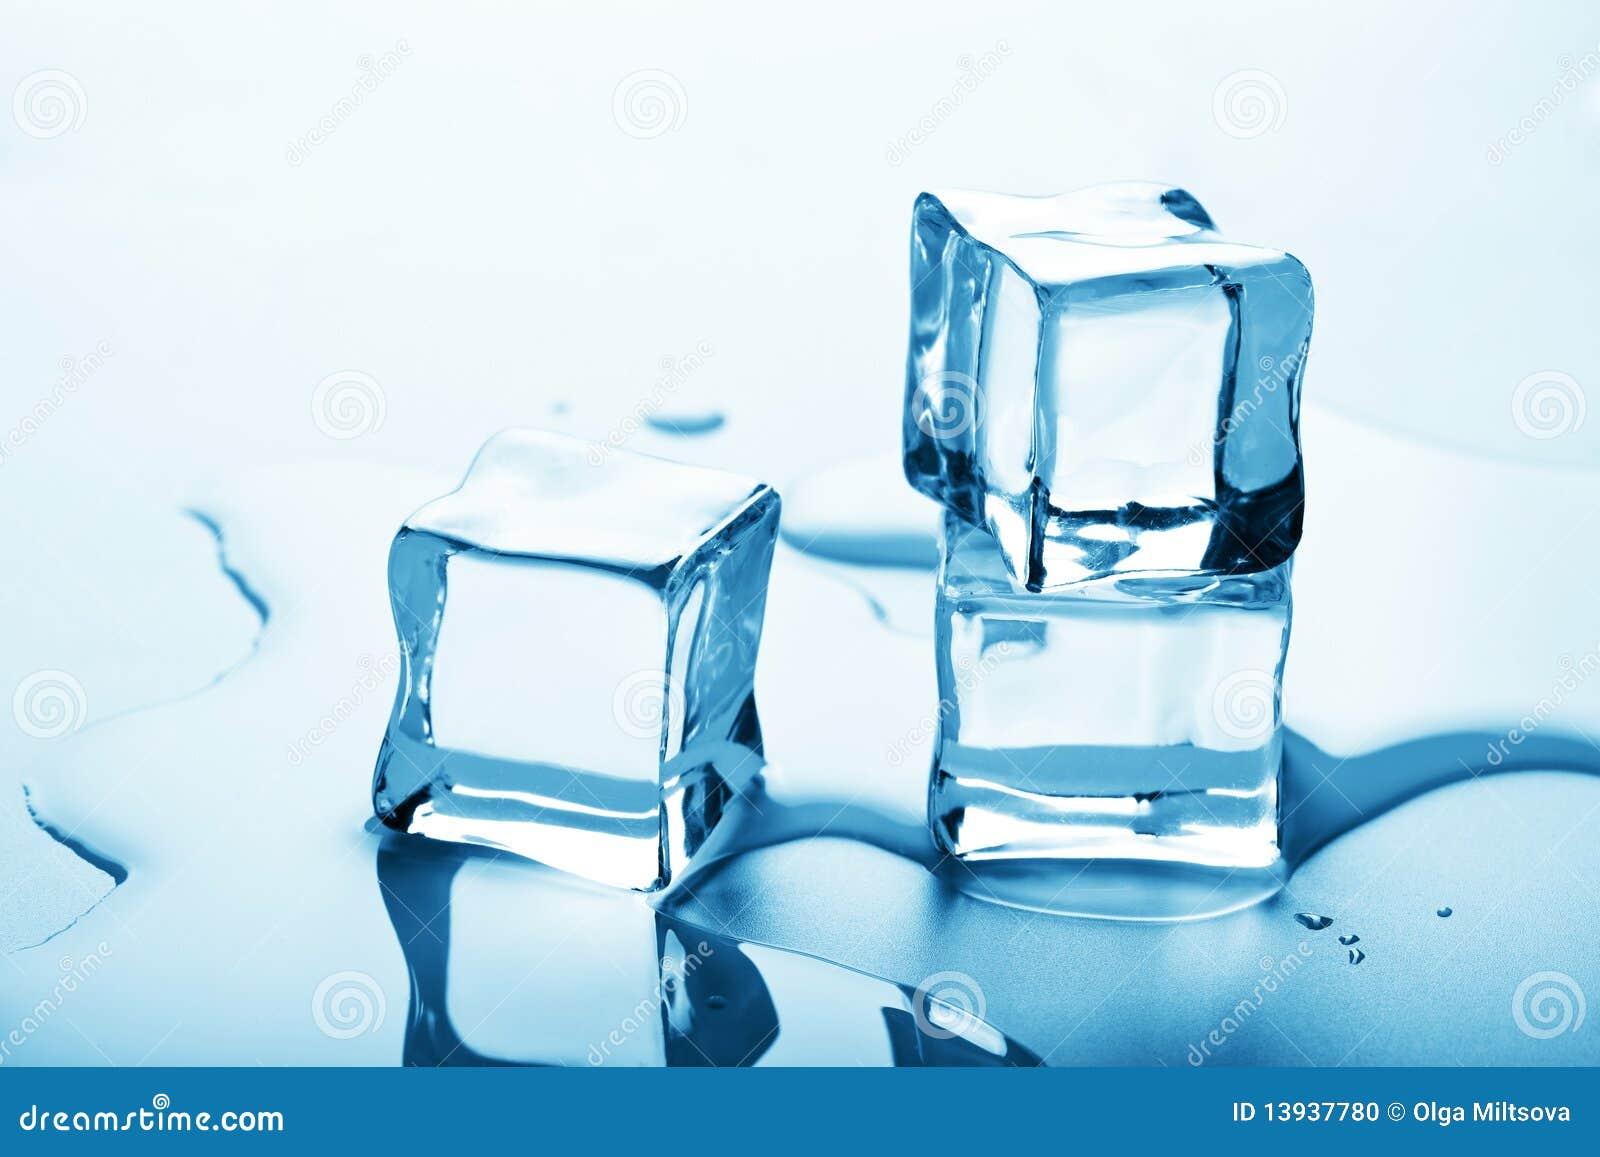 Ice cube melting on my big tits 3